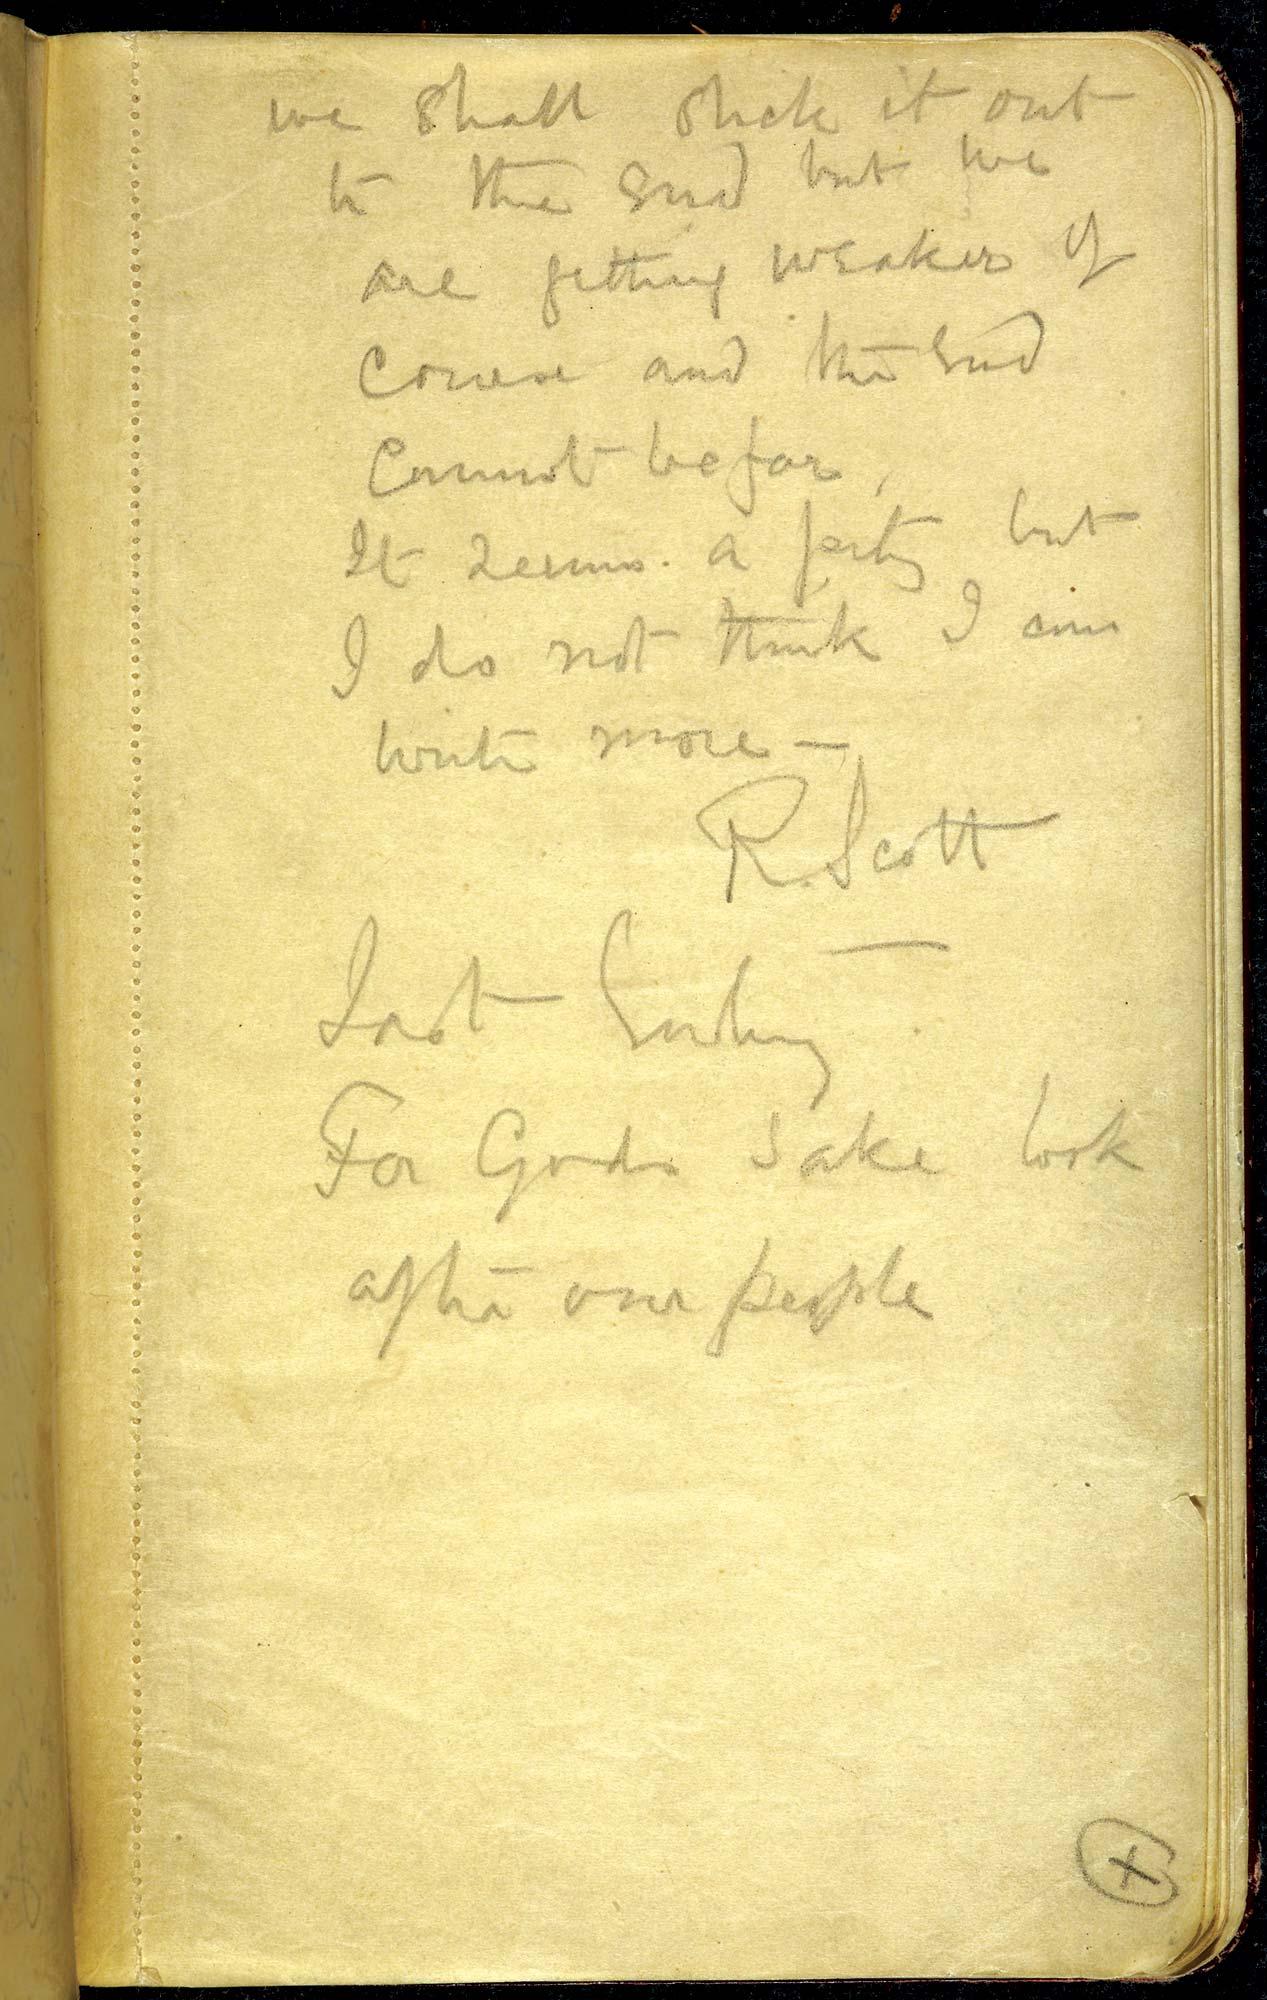 The last entry in Captain Scott's Diary f.39